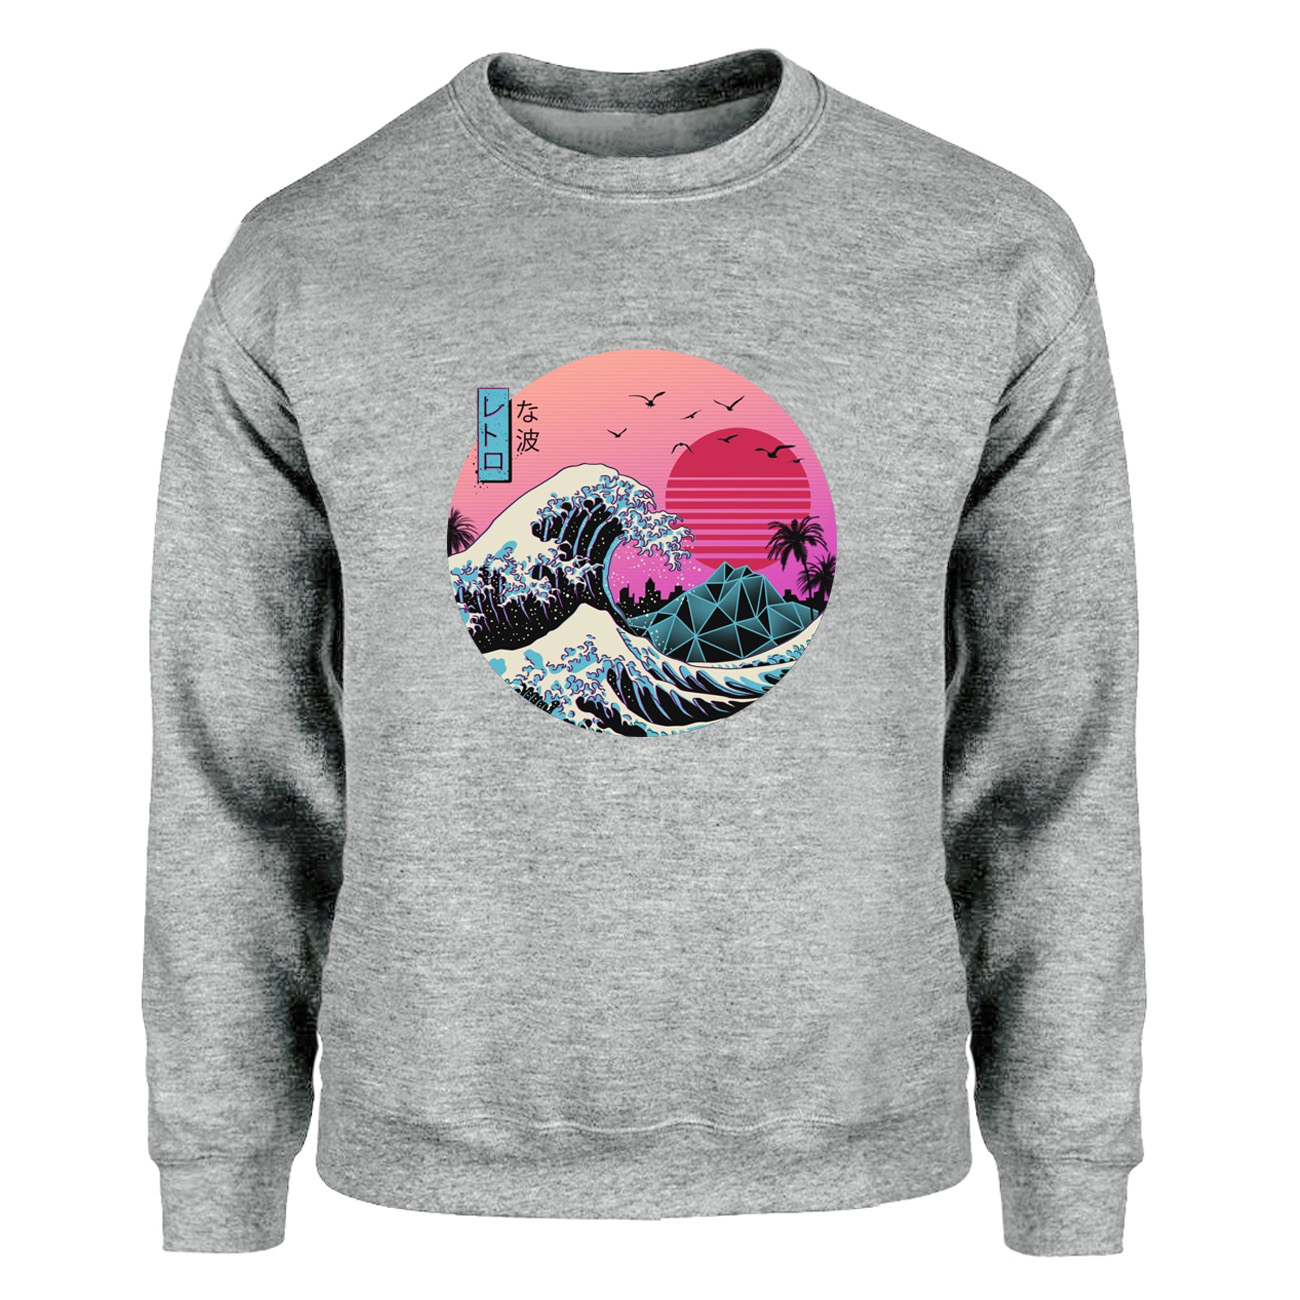 The Great Retro Wave Japan Anime Vaporwave Kanagawa Sweatshirts Men Crewneck Hoodies Painting Raglan Harajuku Fleece Streetwear